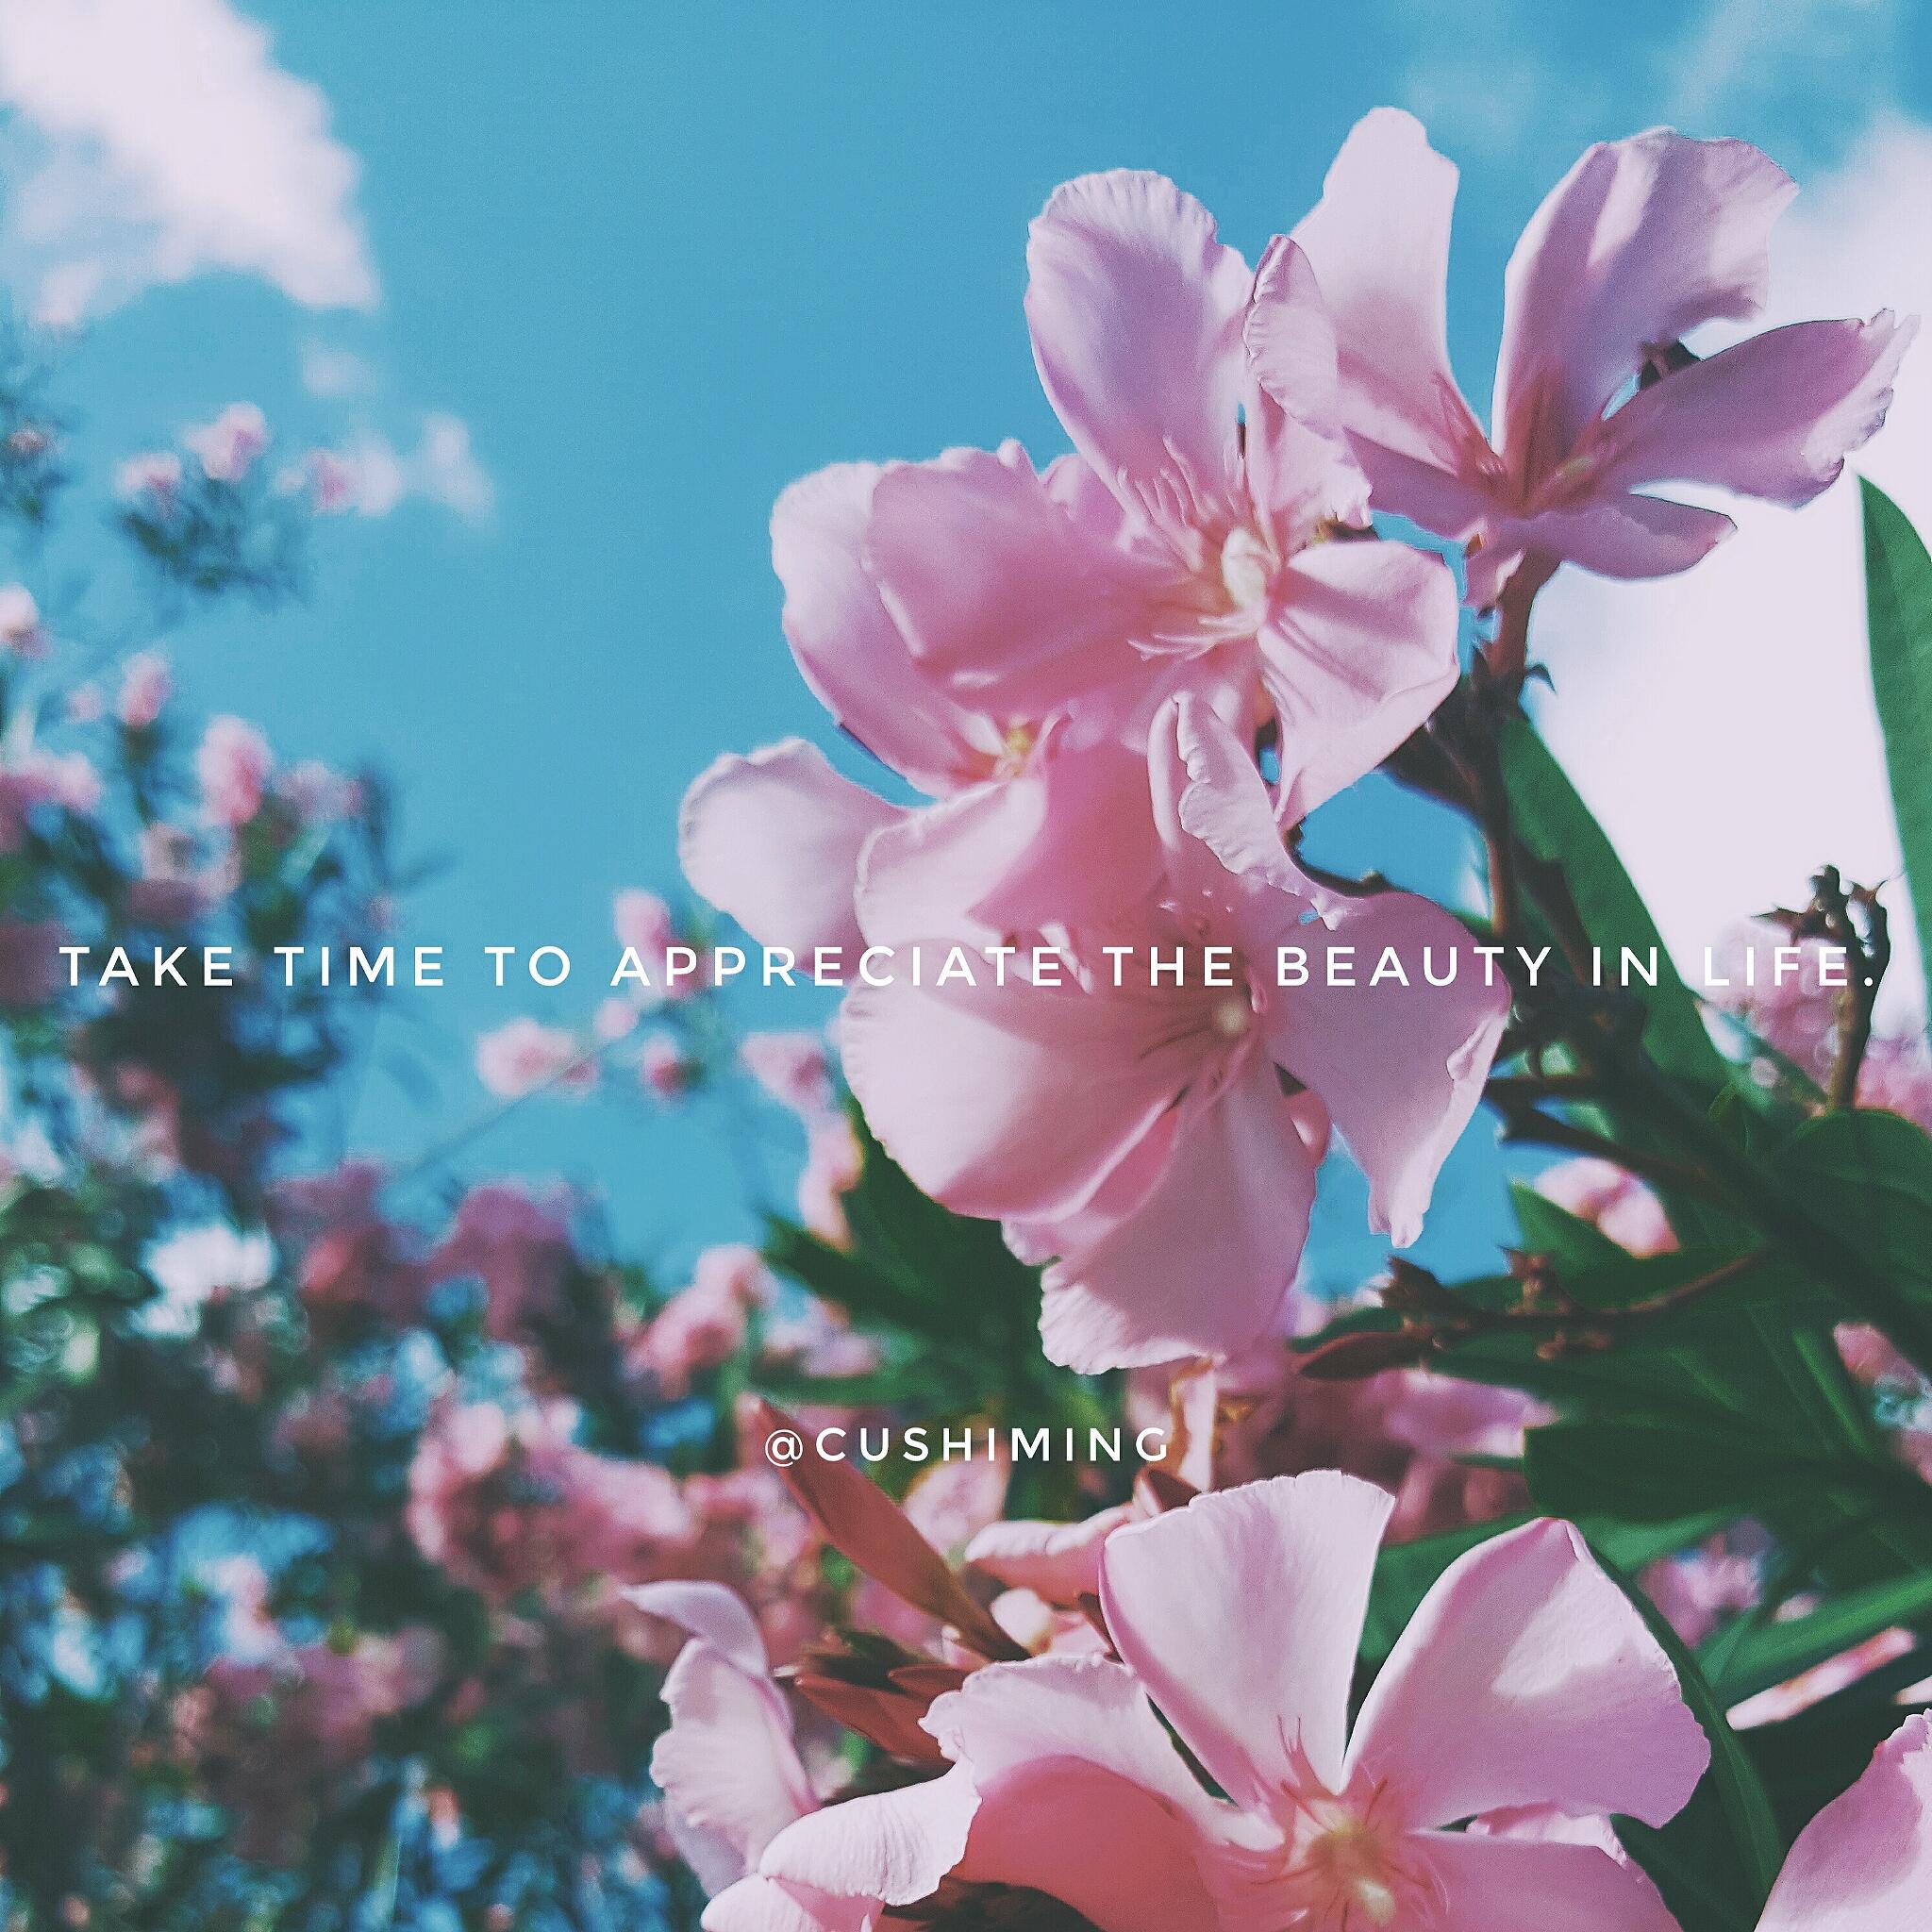 Fashion Style Nature Outdoors Vsco Photography Vscocam Photooftheday Styleonvsco Sky Flowers Trees Quote Quotes Inspiration Cushiming Vsco